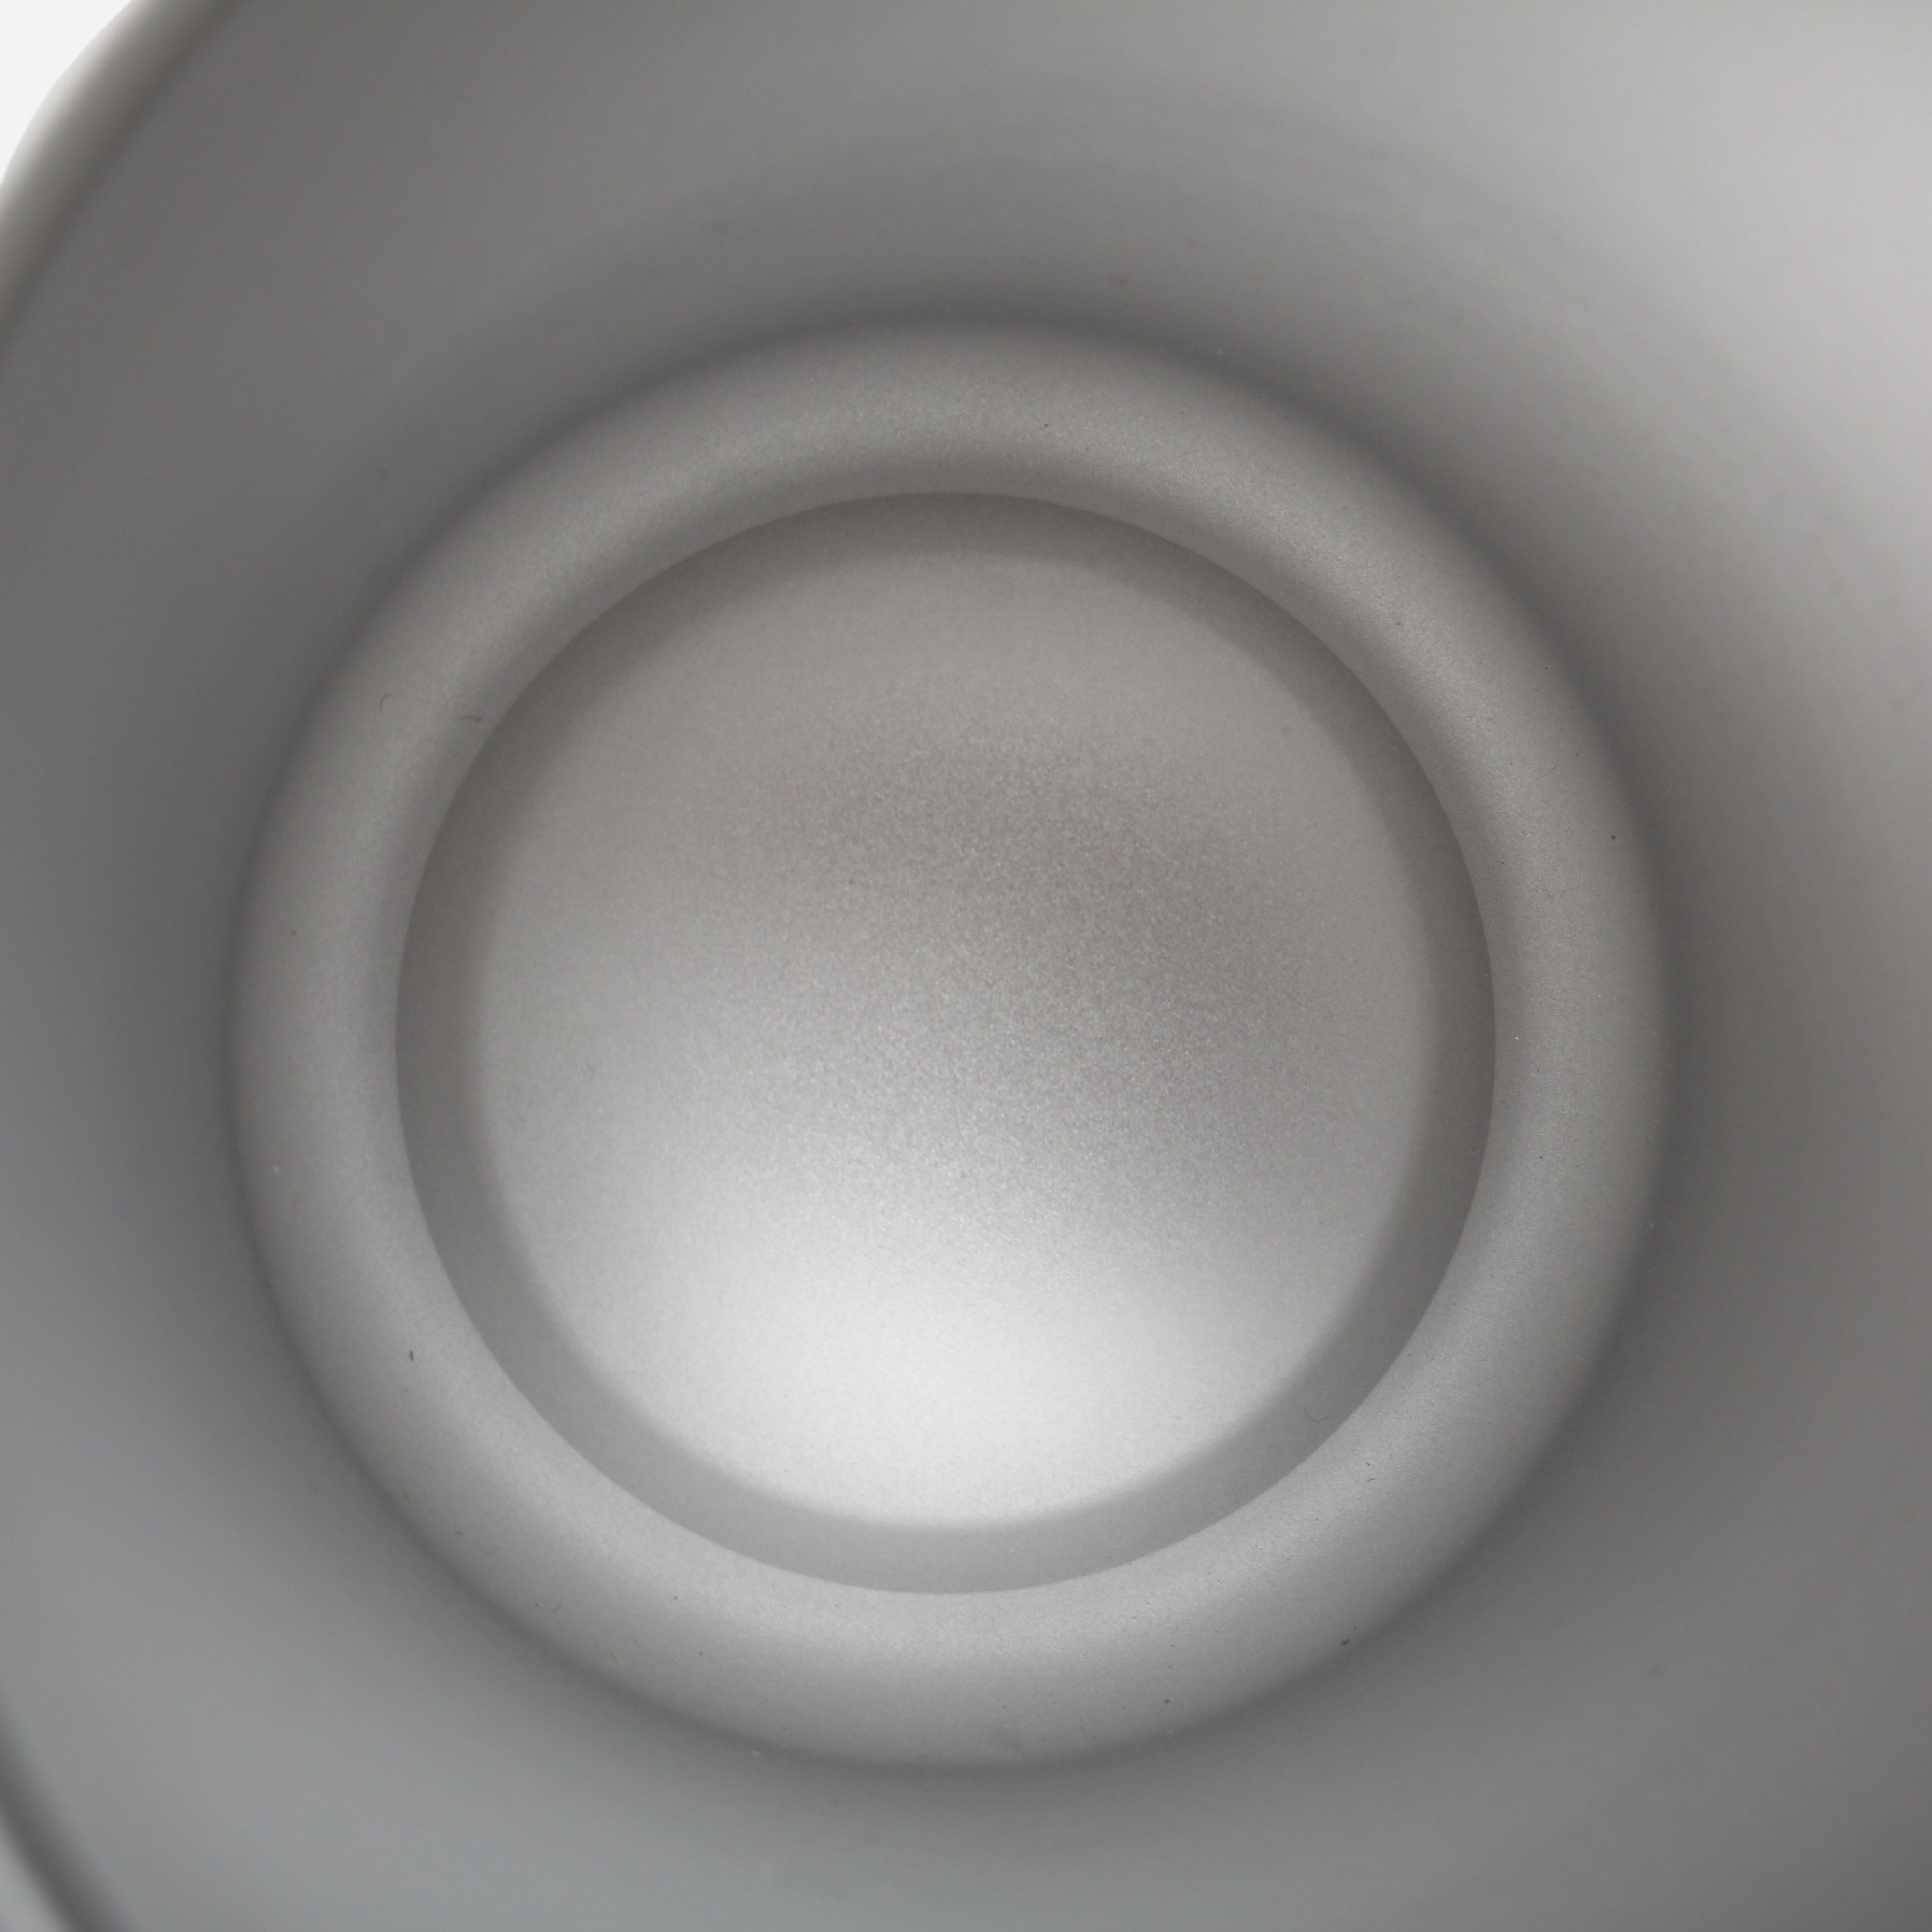 Earthwell EA-72640 CUP 16OZ / 47CL